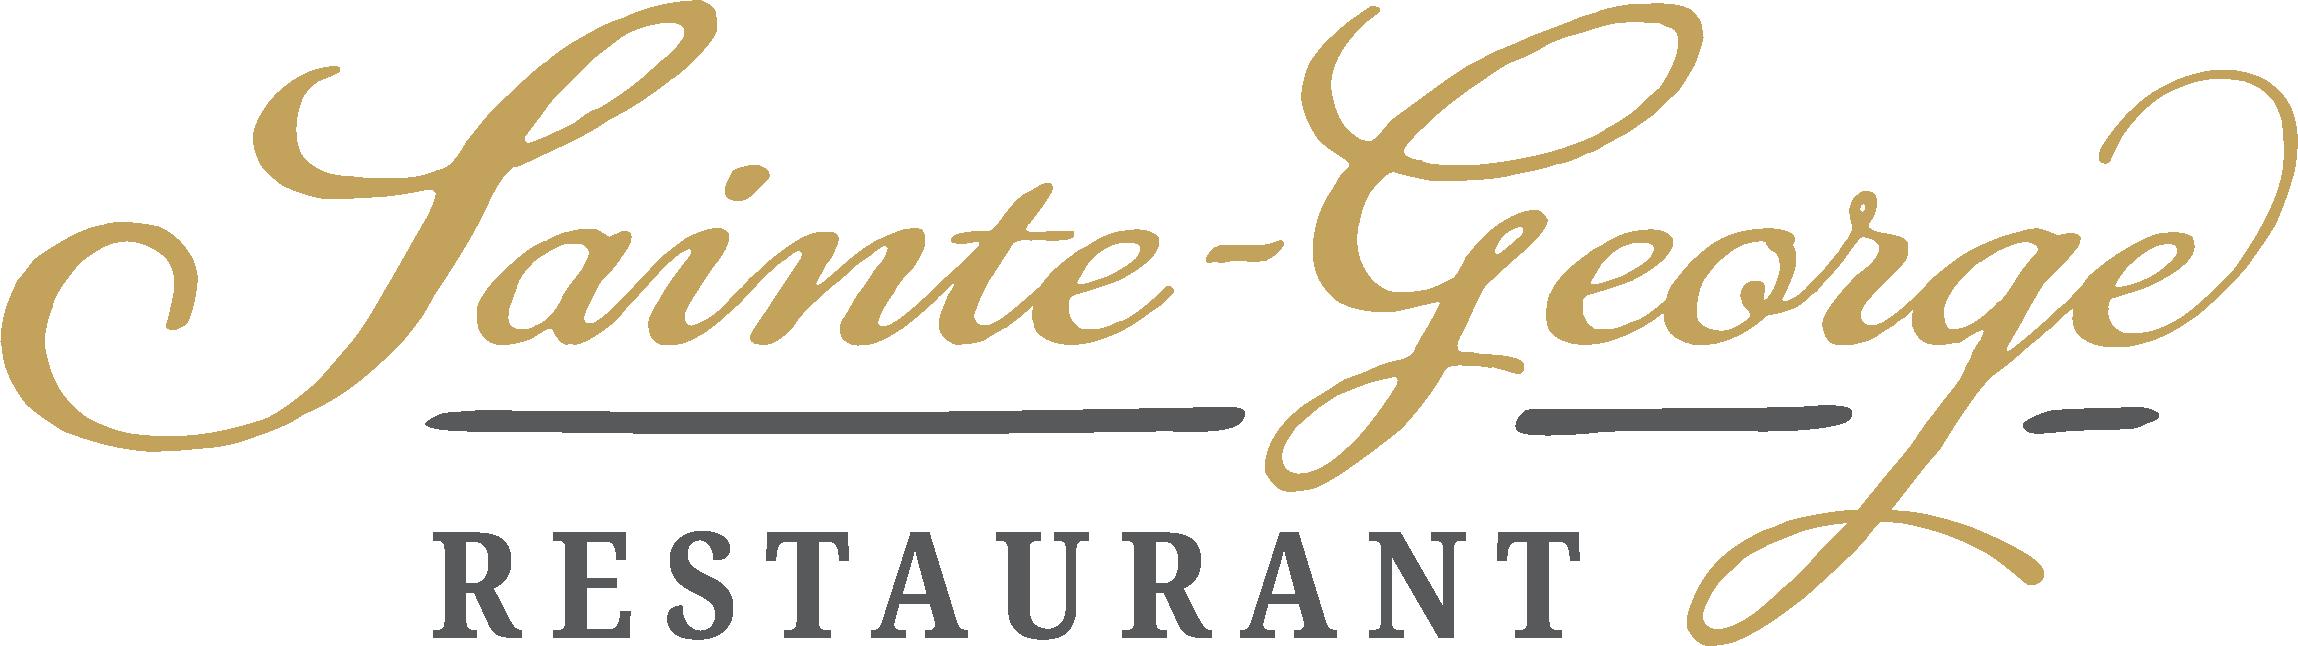 Sainte-George Restaurant